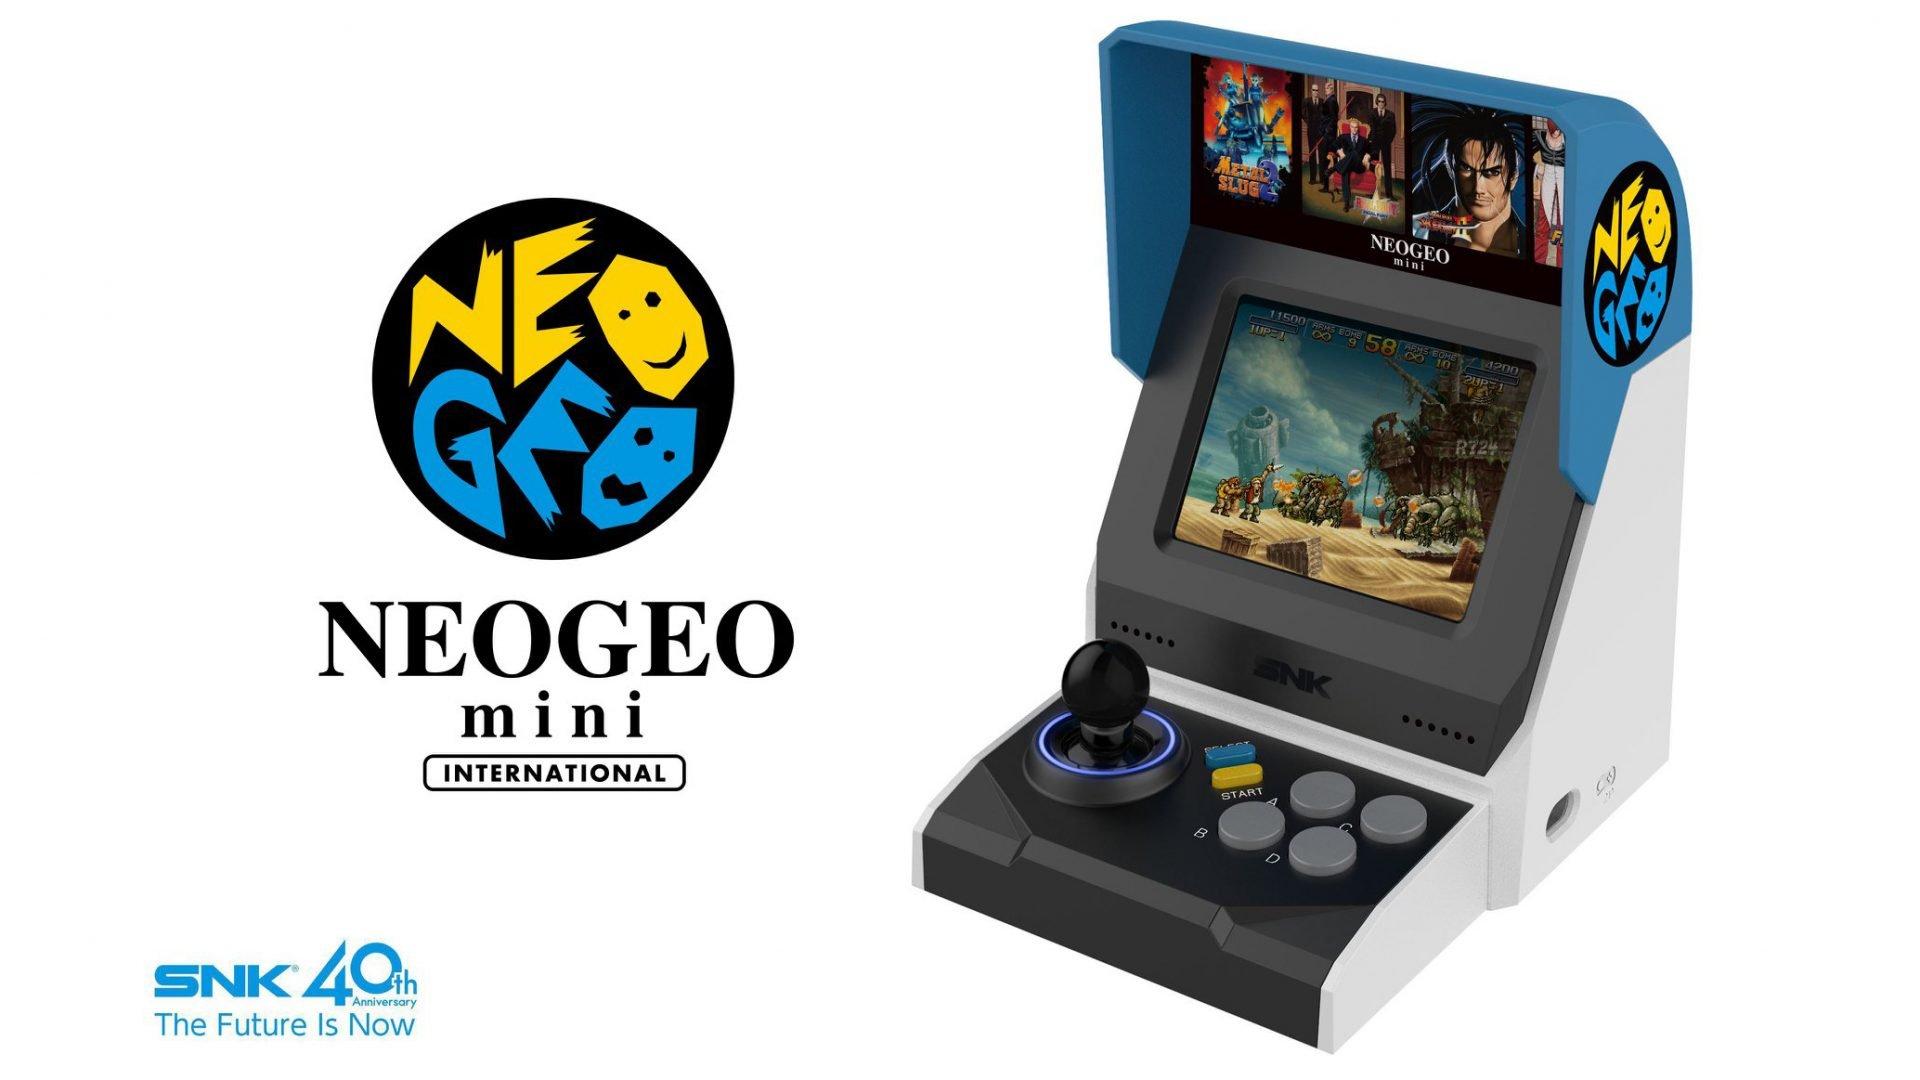 neo geo mini promo image